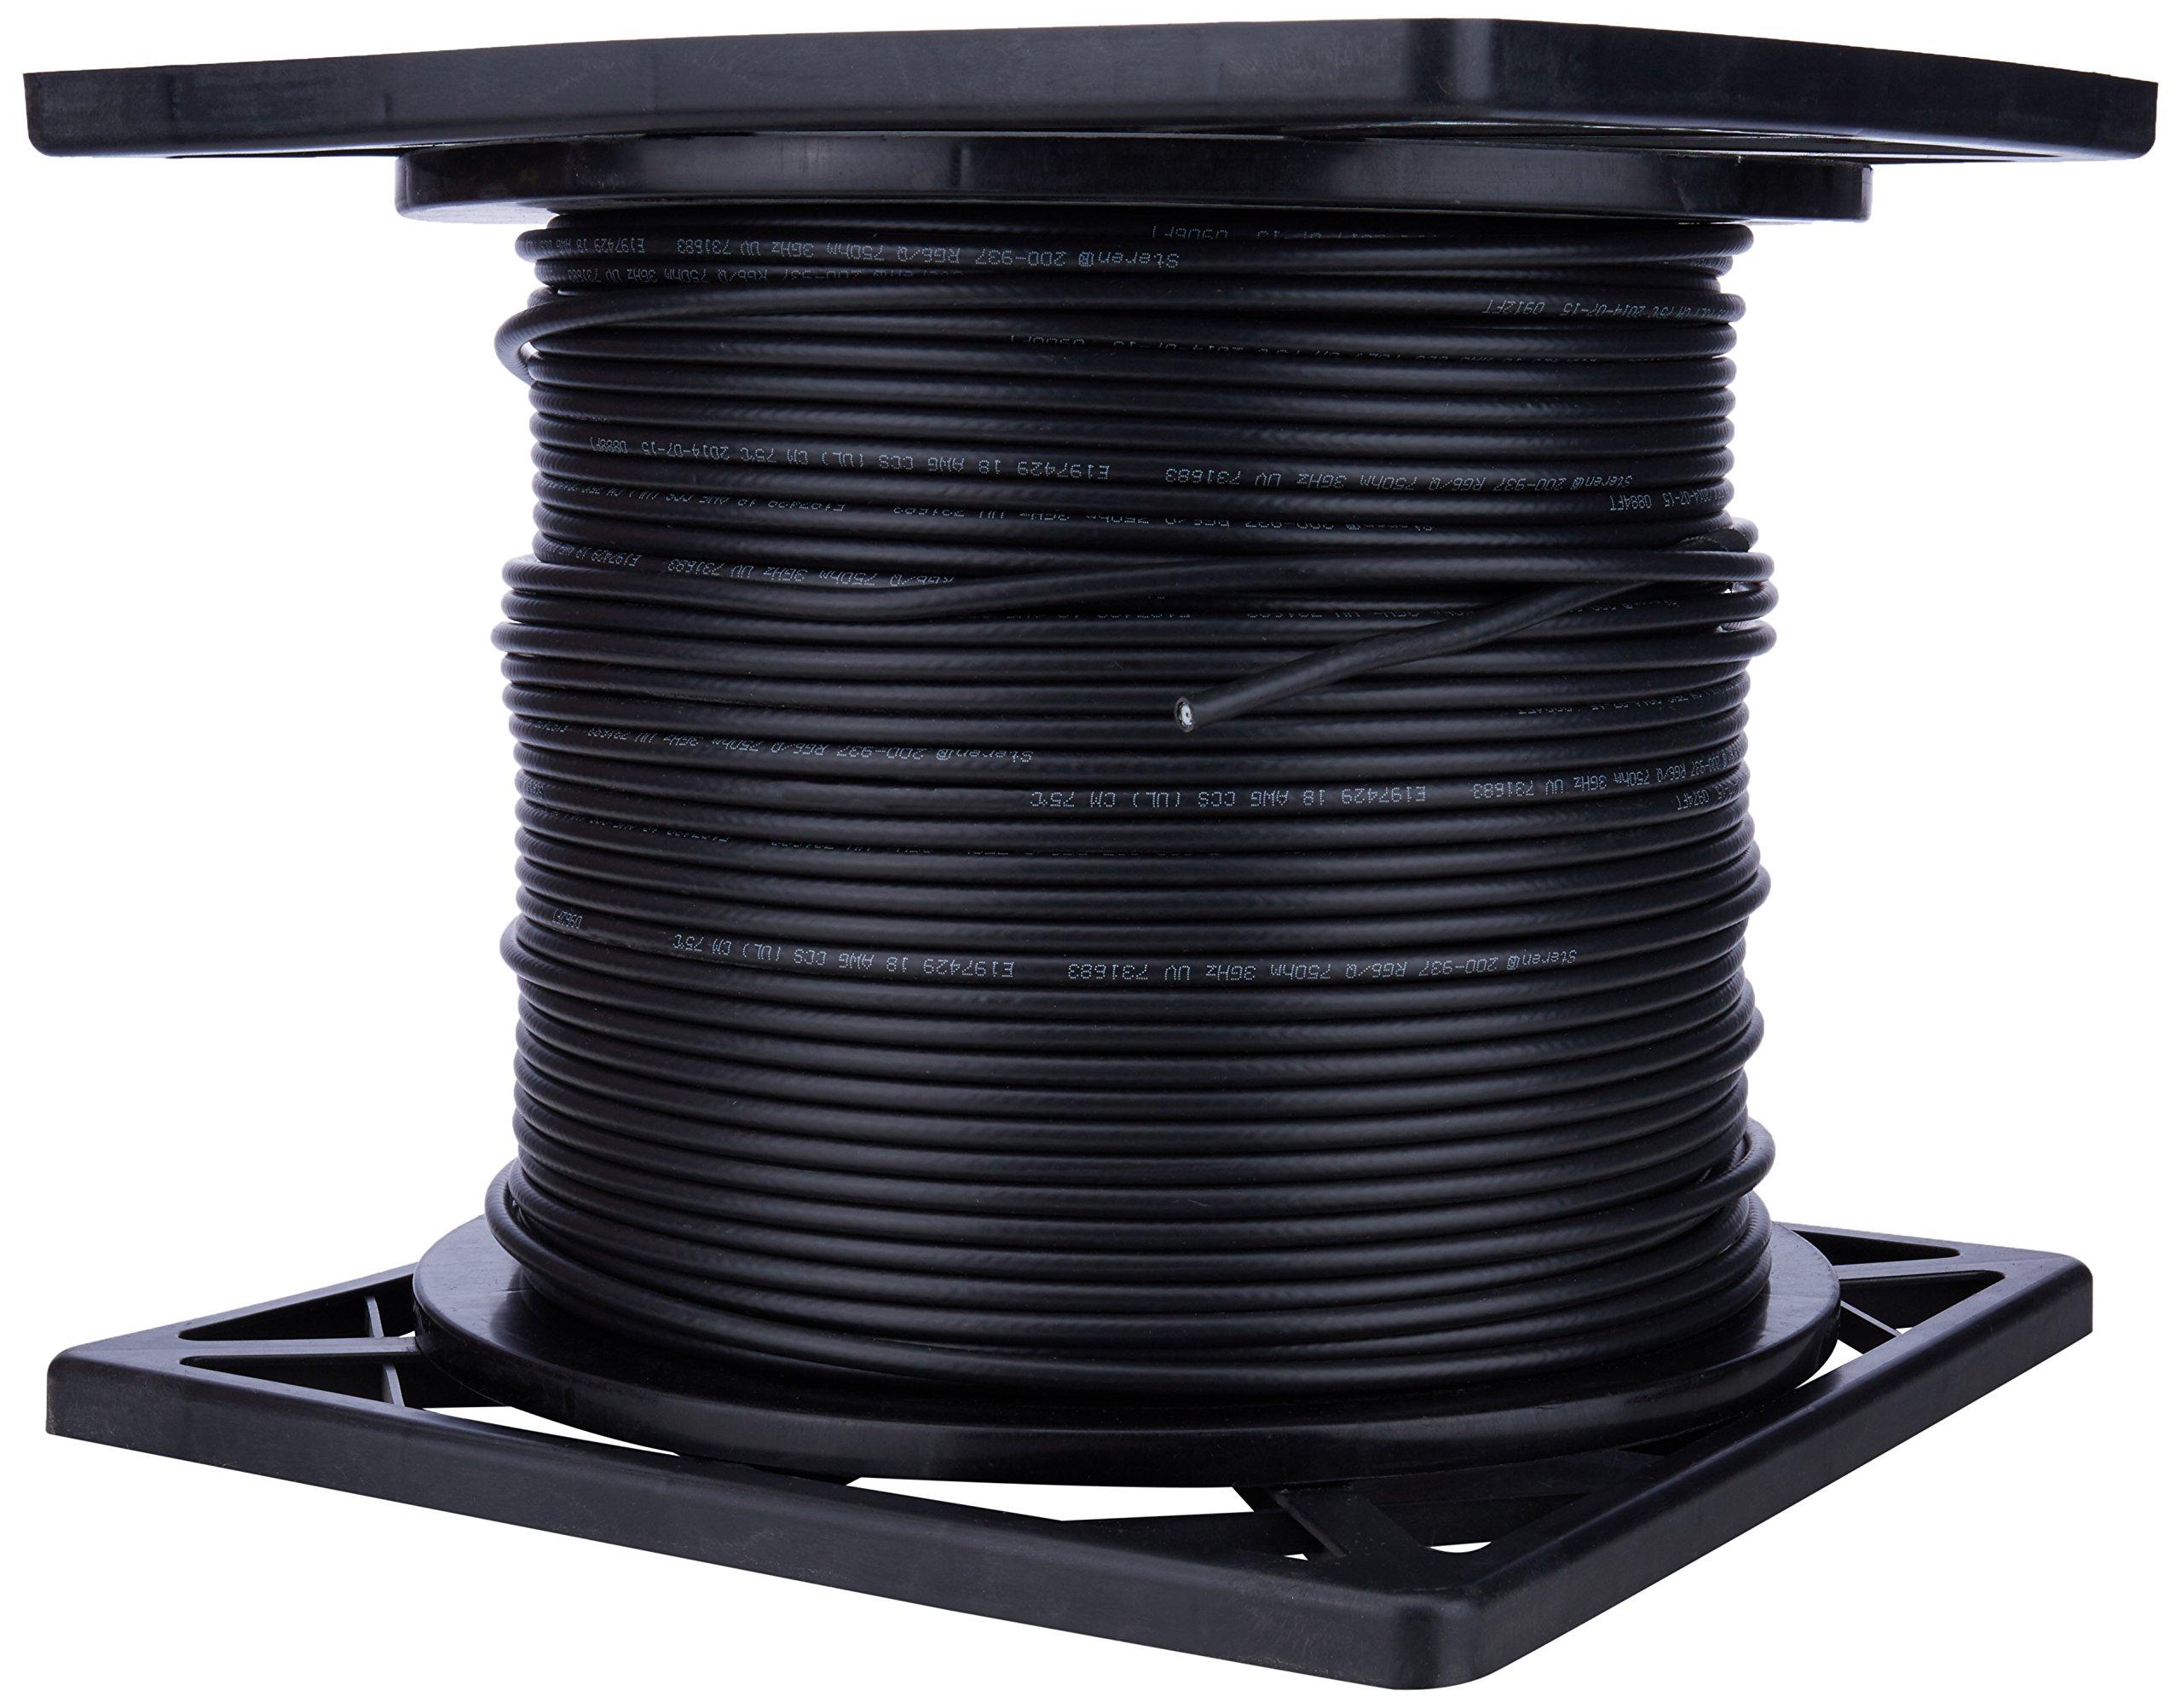 Steren 200-937BK 1000 feet RG6 Ul/cm Quadsld Coax Cable - Black